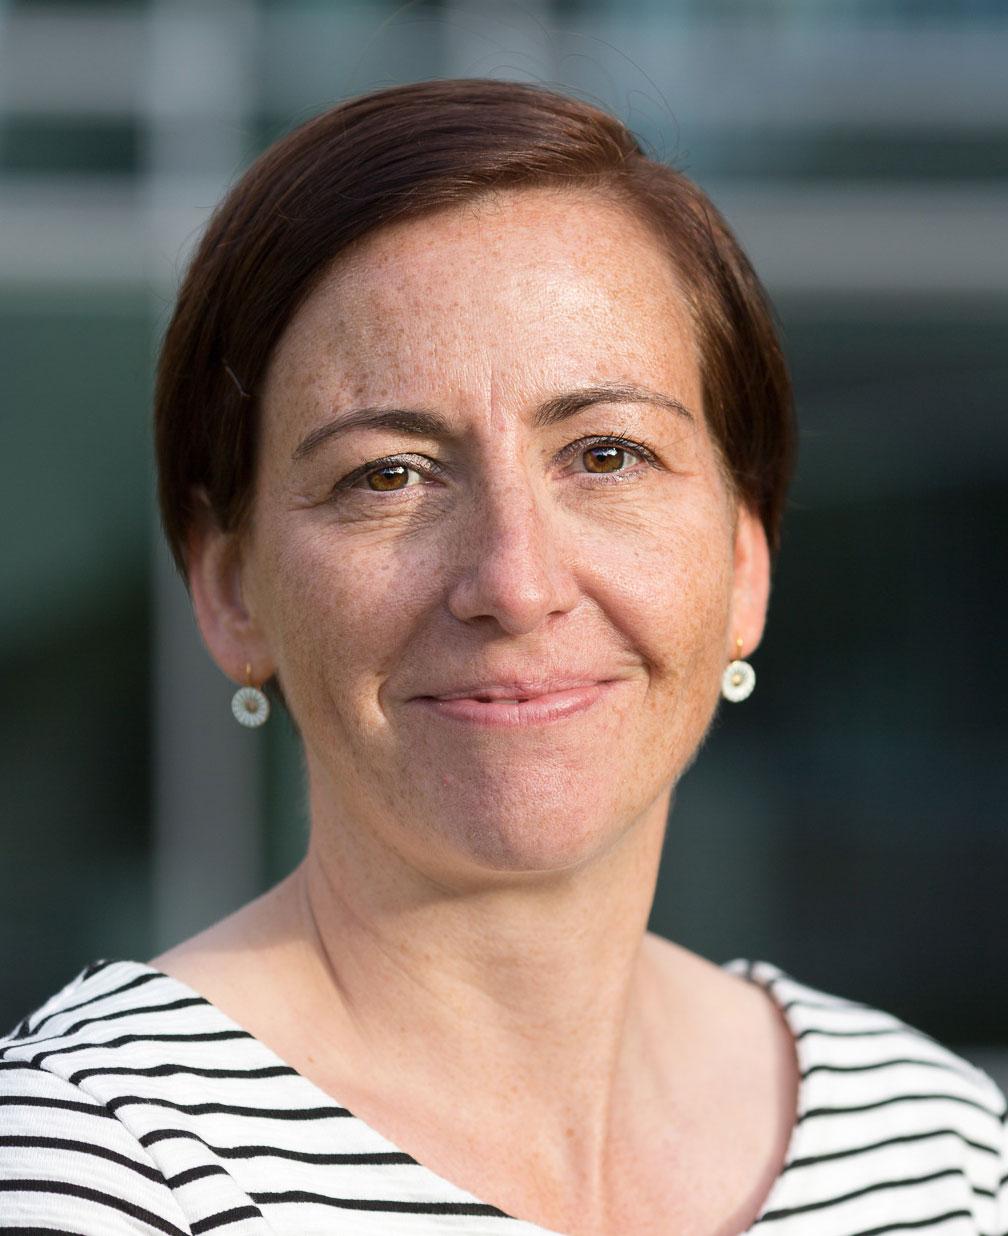 Birgitte Lodberg Pedersen